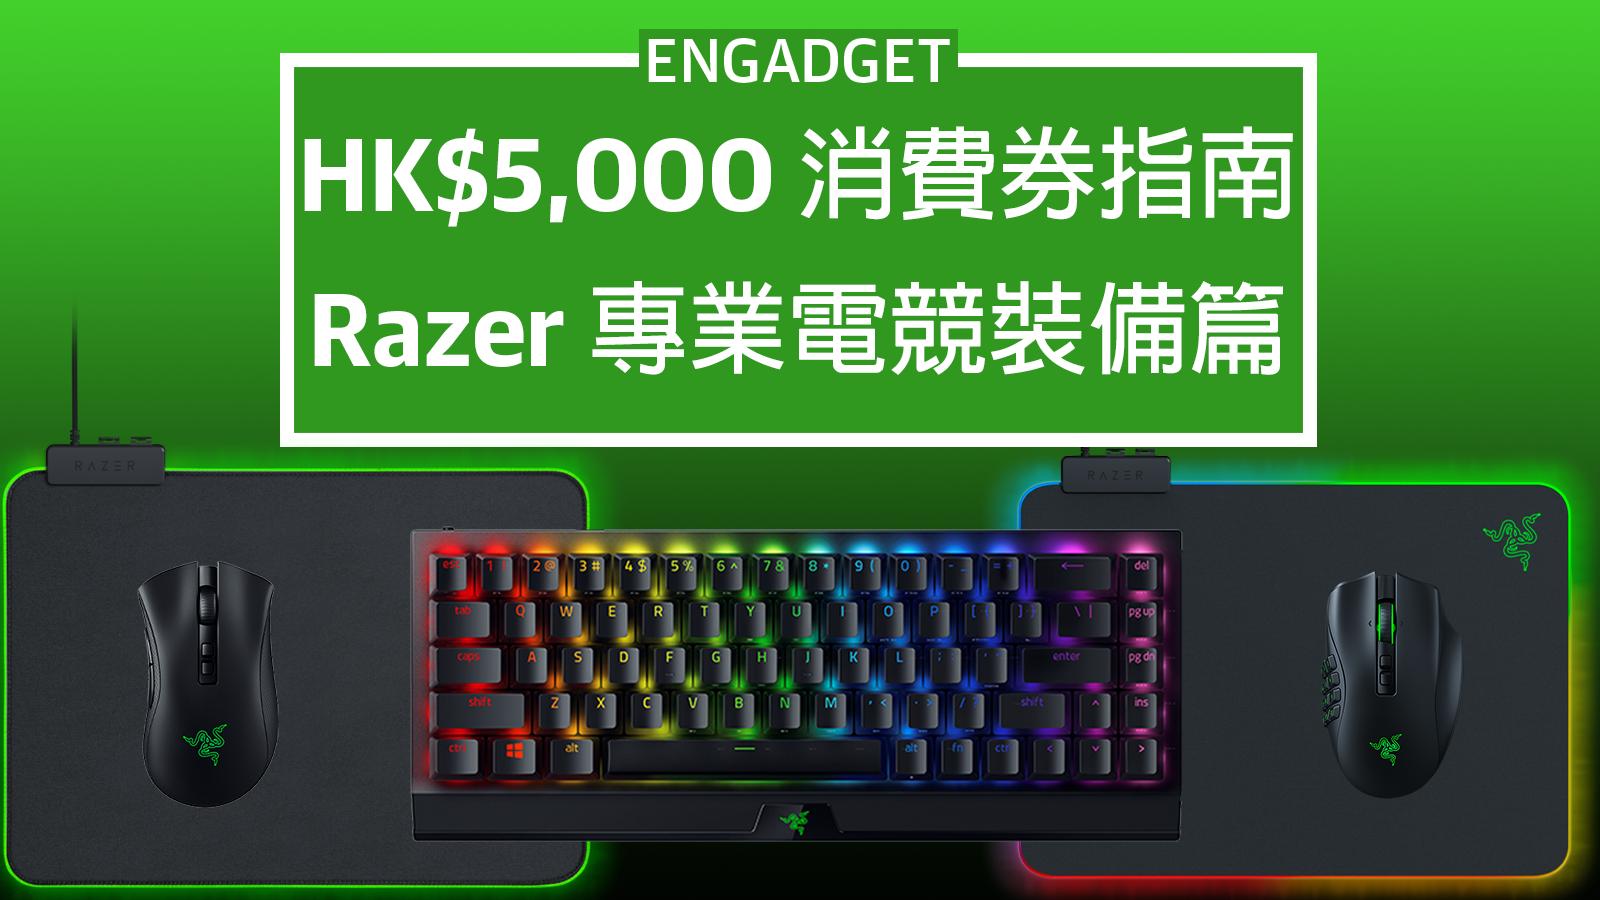 5k-budget-razer-thumbnail